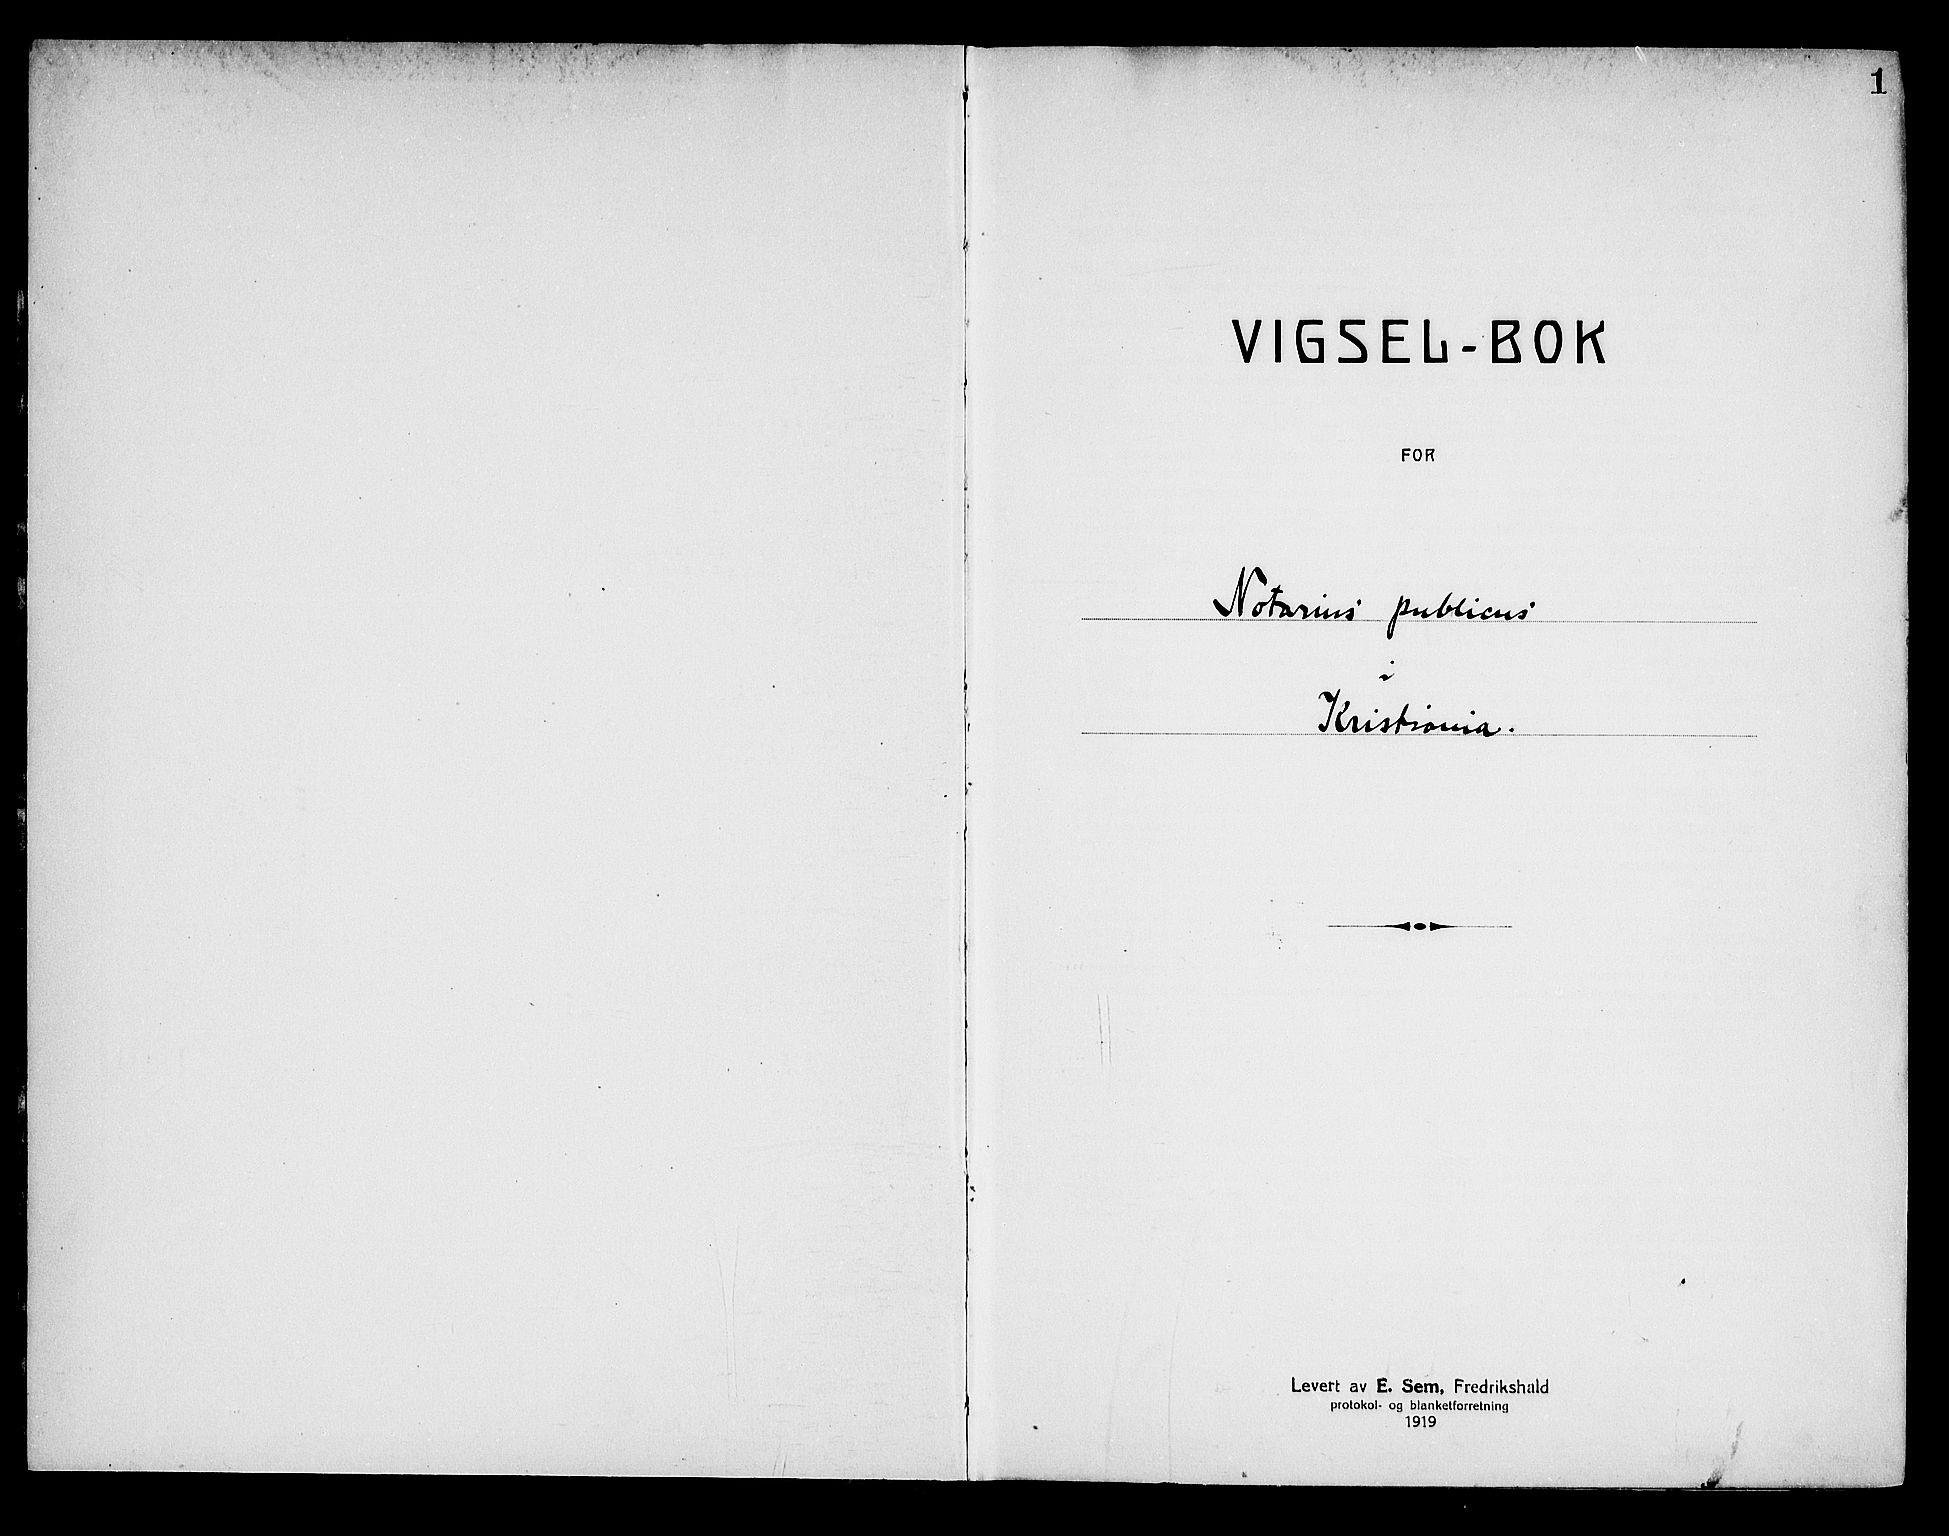 SAO, Oslo byfogd avd. I, L/Lb/Lbb/L0014: Notarialprotokoll, rekke II: Vigsler, 1920-1921, s. 1a